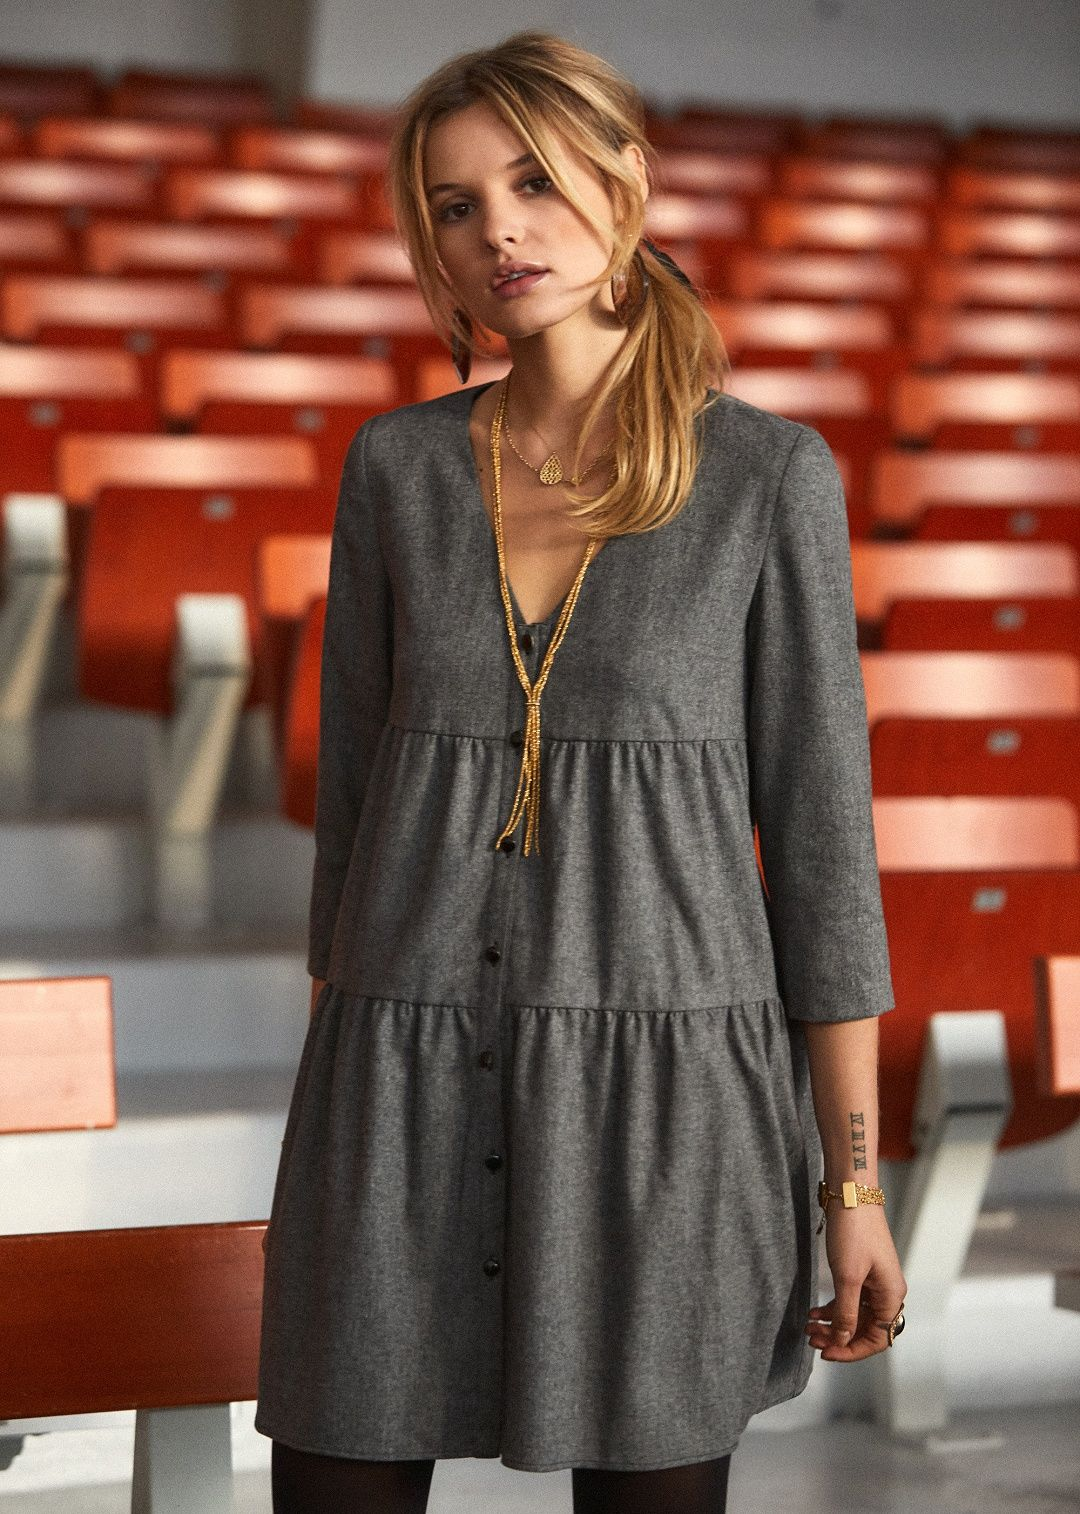 Sézane - Robe Amy   art teacher chic   Pinterest   Robe, Couture and ... 6c6c6e2c9000